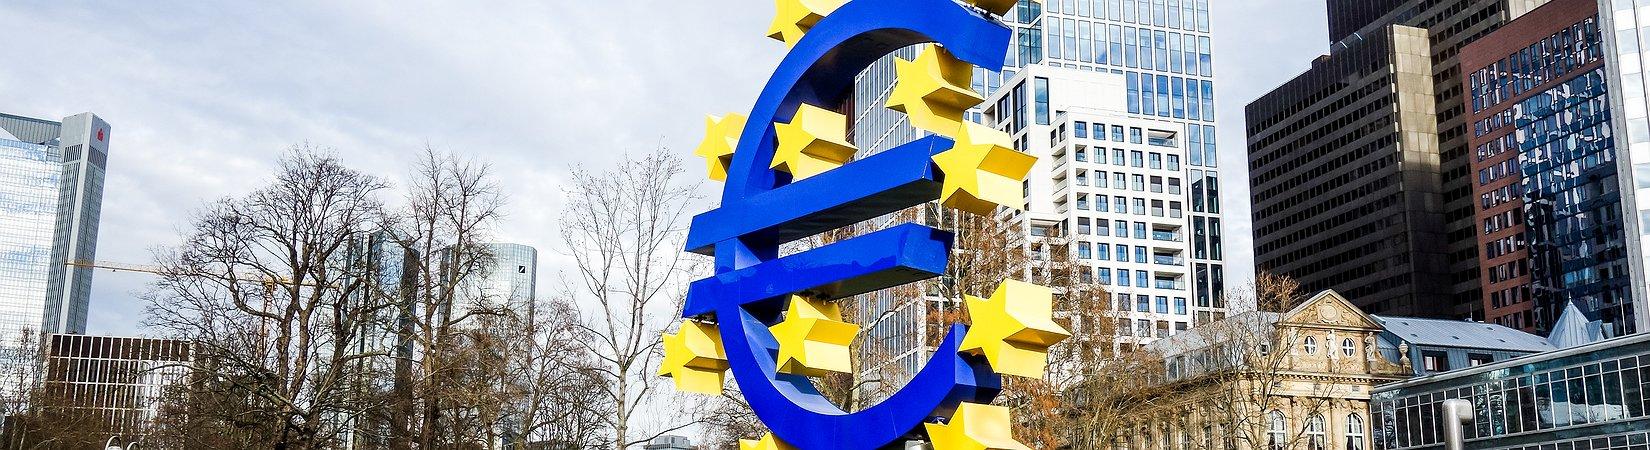 Bloomberg prevê que zona euro tenha crescido 0,4% no último trimestre de 2016